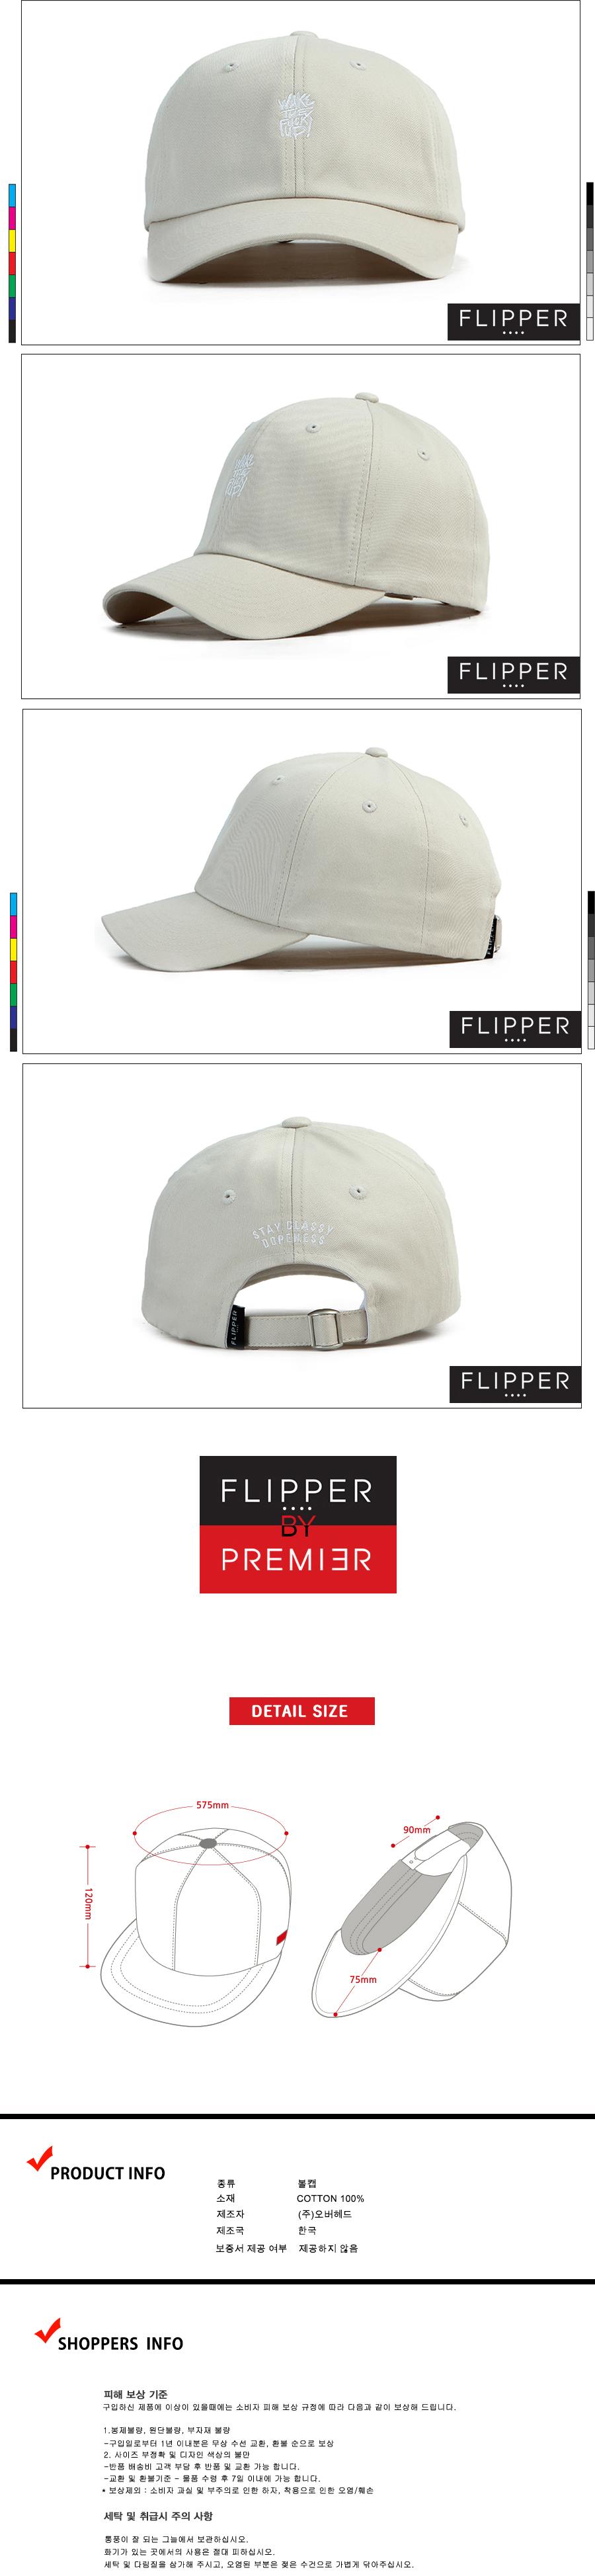 [ PREMIER ] [Premier] Flipper Ball Cap Wake Beige (FL176)